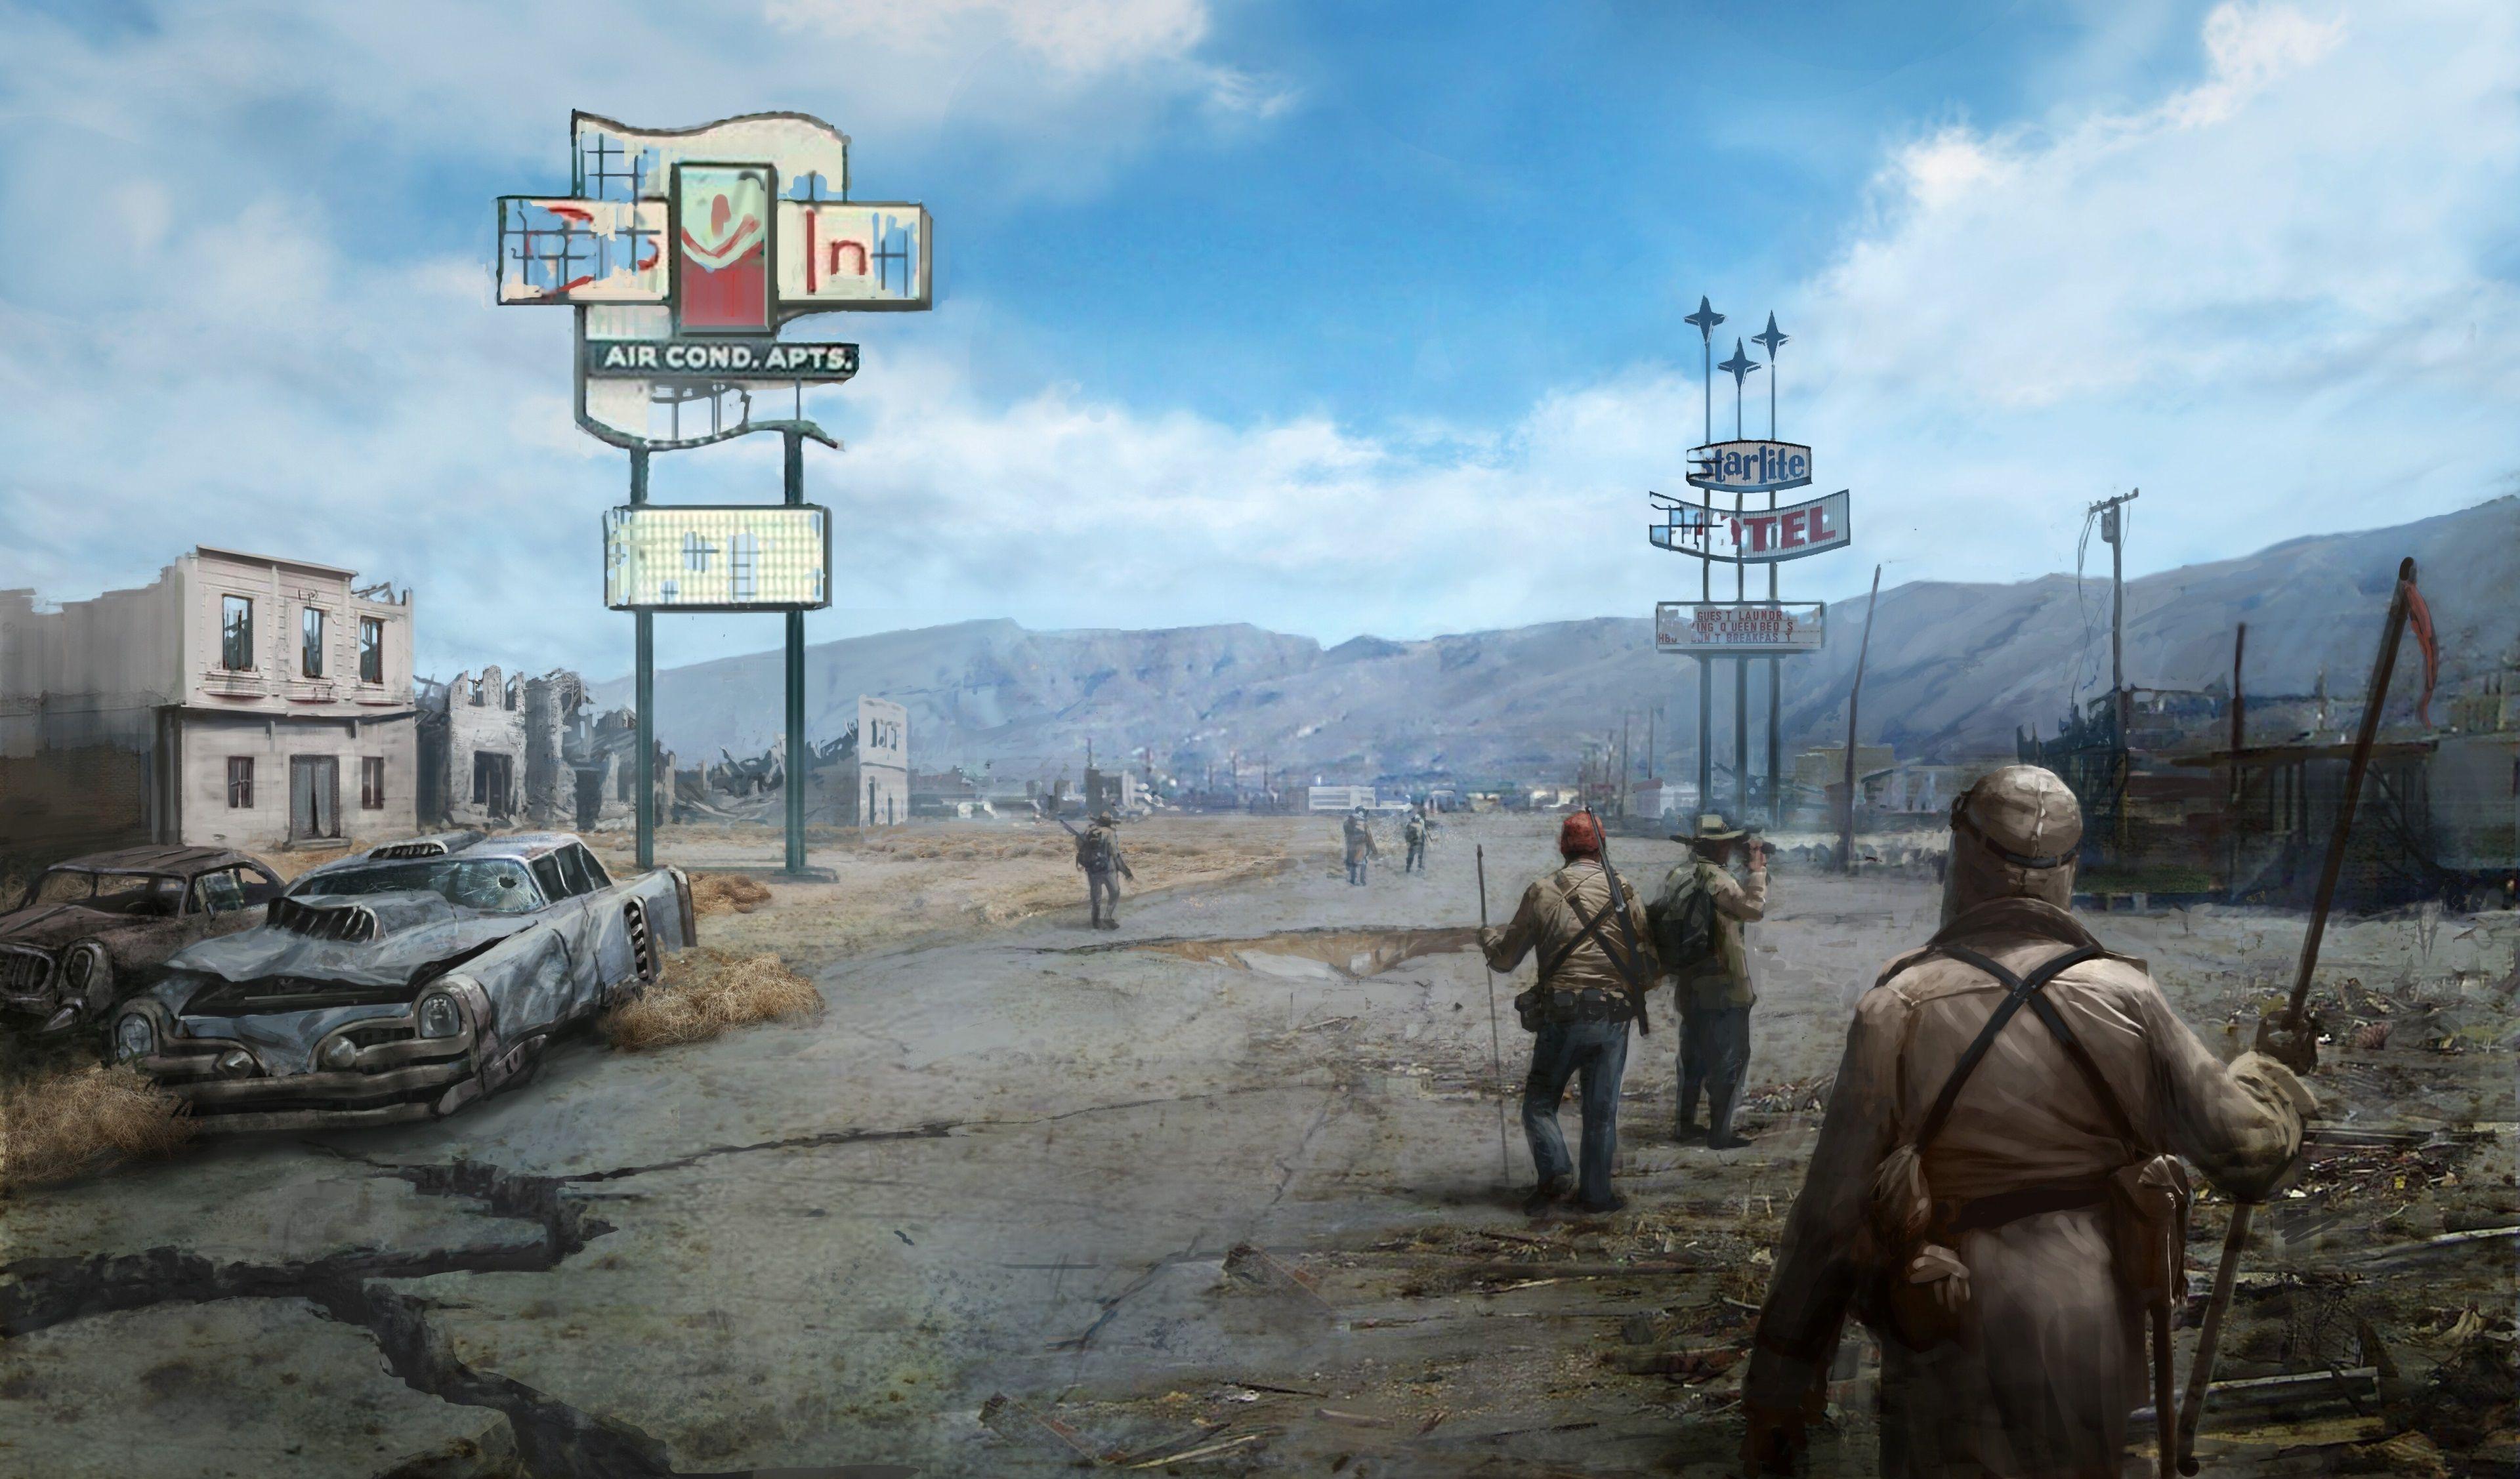 3840x2254 Fallout New Vegas 4k Wallpaper For Desktop Background Fallout New Vegas Fallout Concept Art Apocalyptic